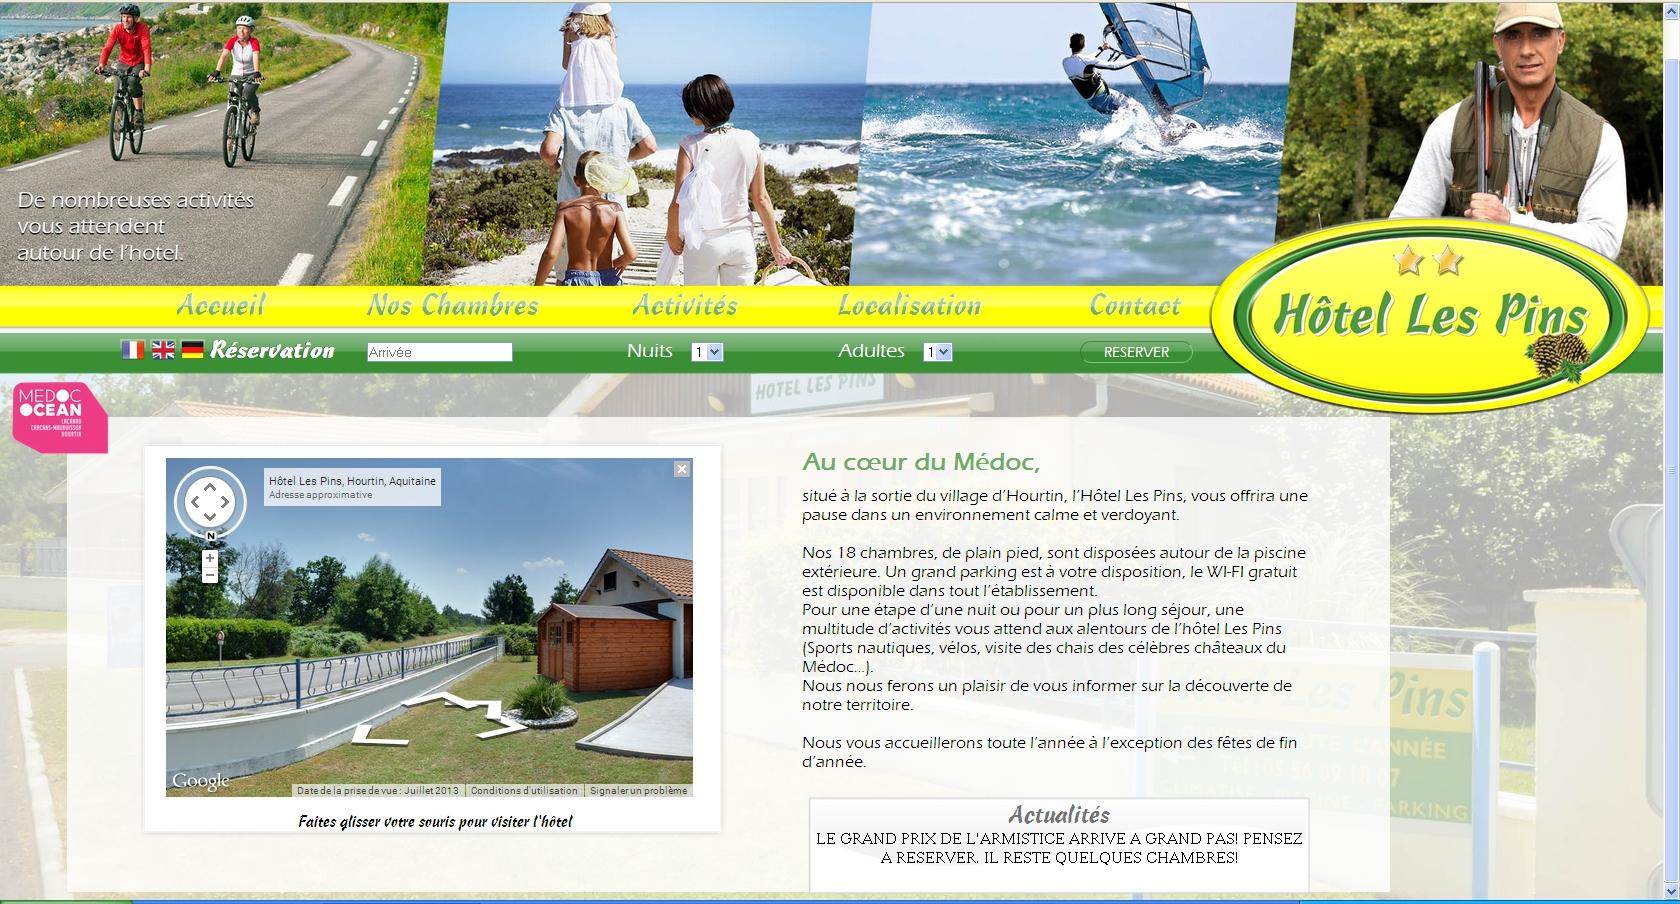 http://naytheet.fr/Web/images/reas/HtelLesPins2.jpg